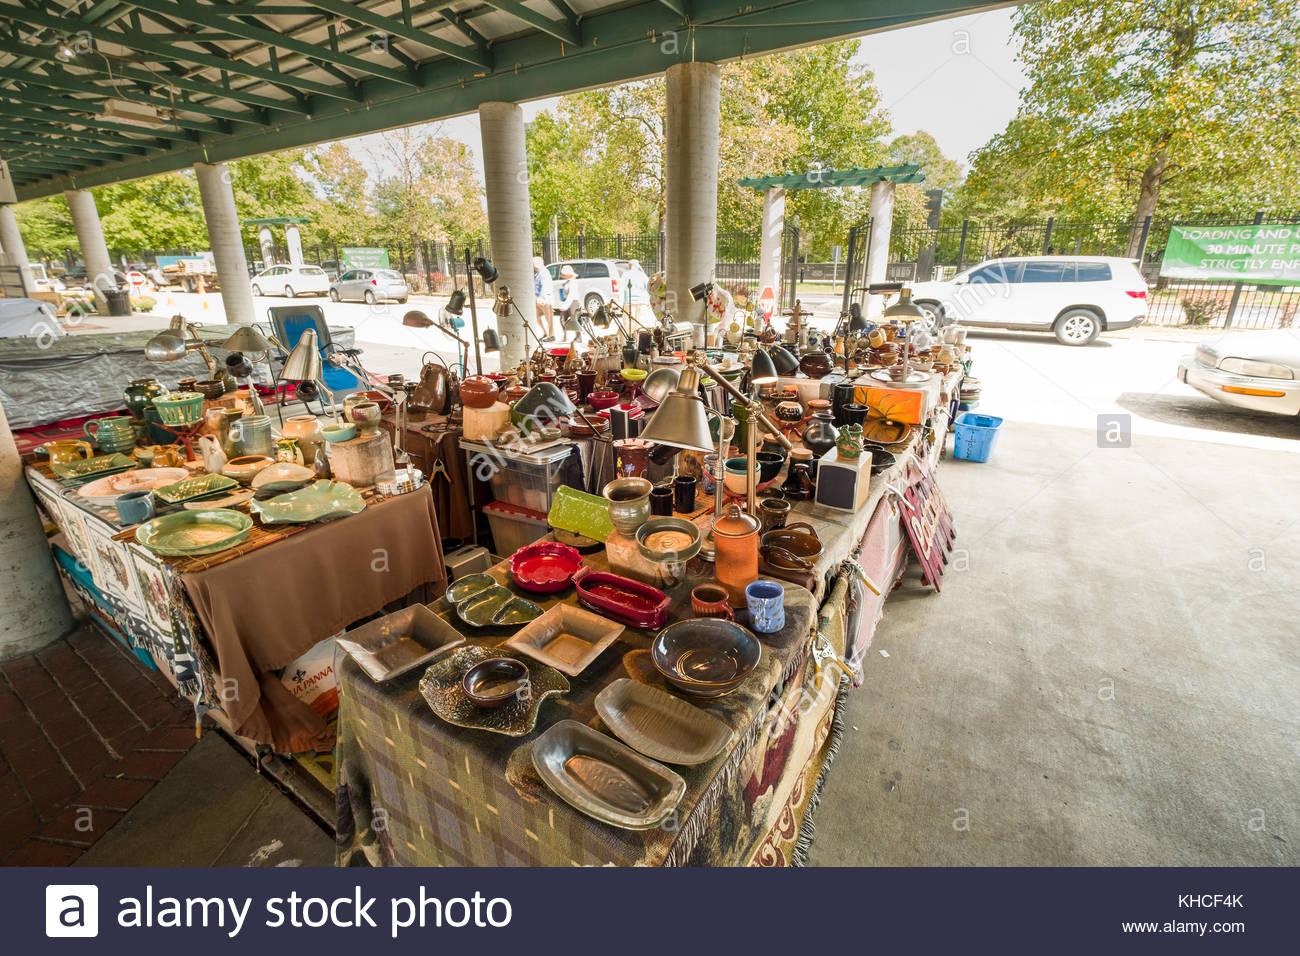 Nashville farmers market stock photos nashville farmers - Market place at garden state park ...